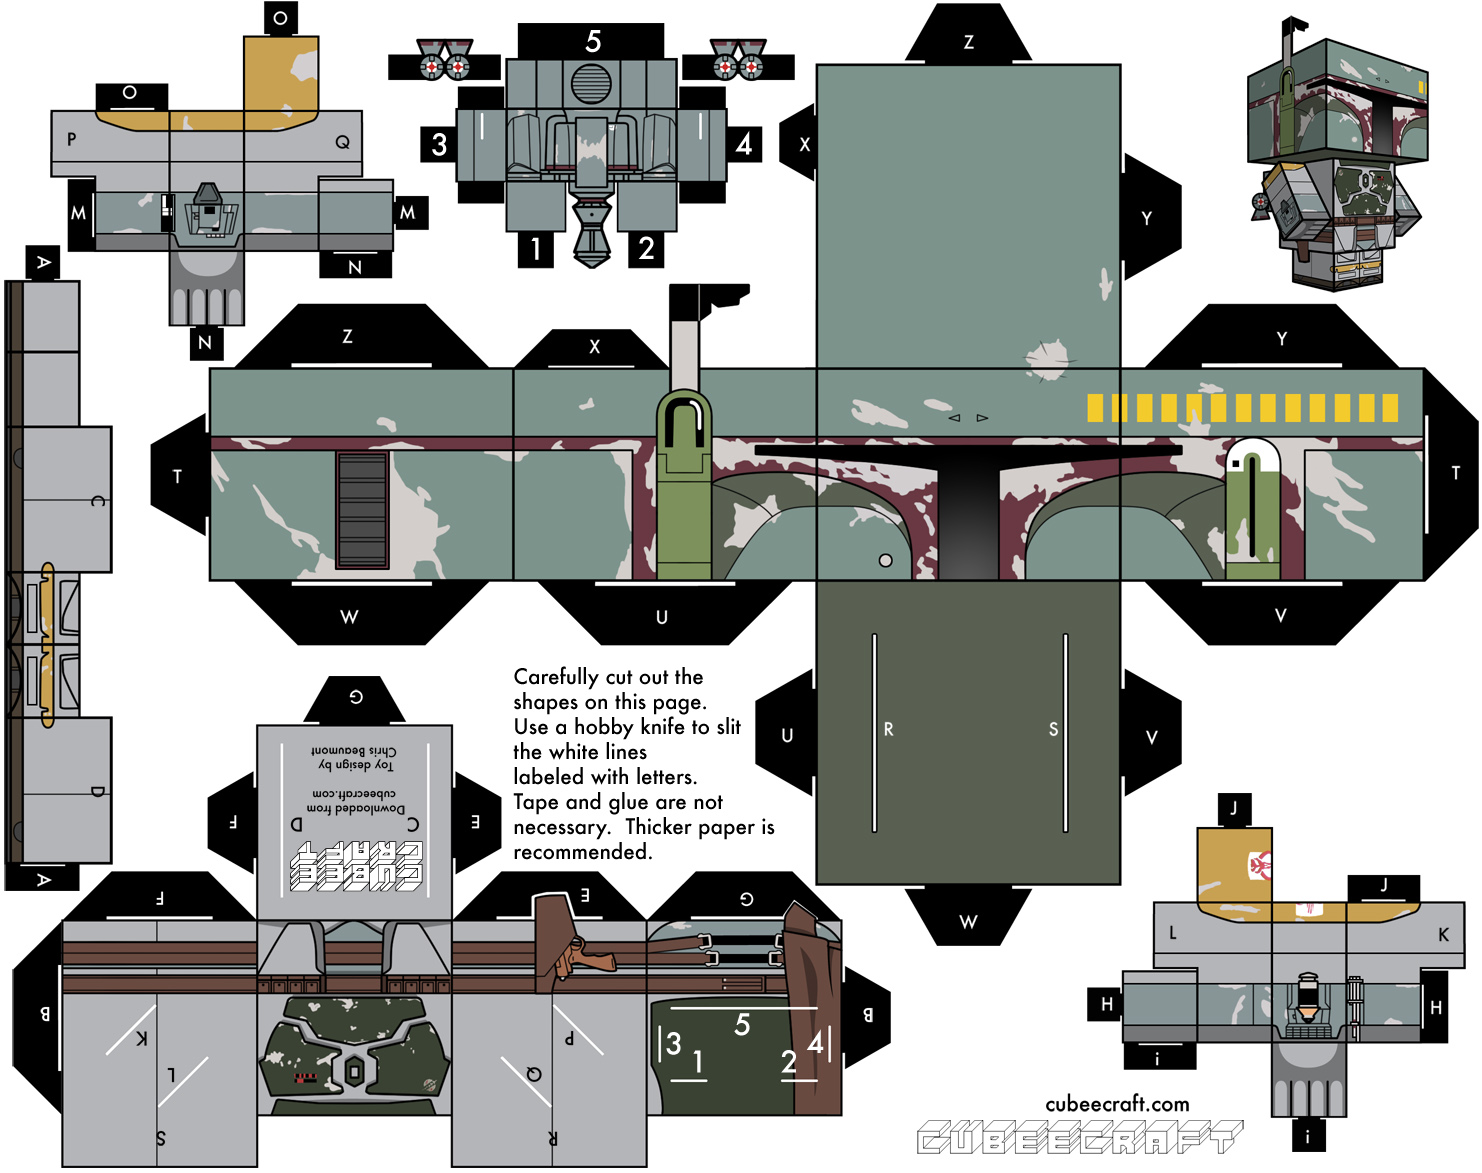 paper shock boba fett star wars by cubeecraft. Black Bedroom Furniture Sets. Home Design Ideas